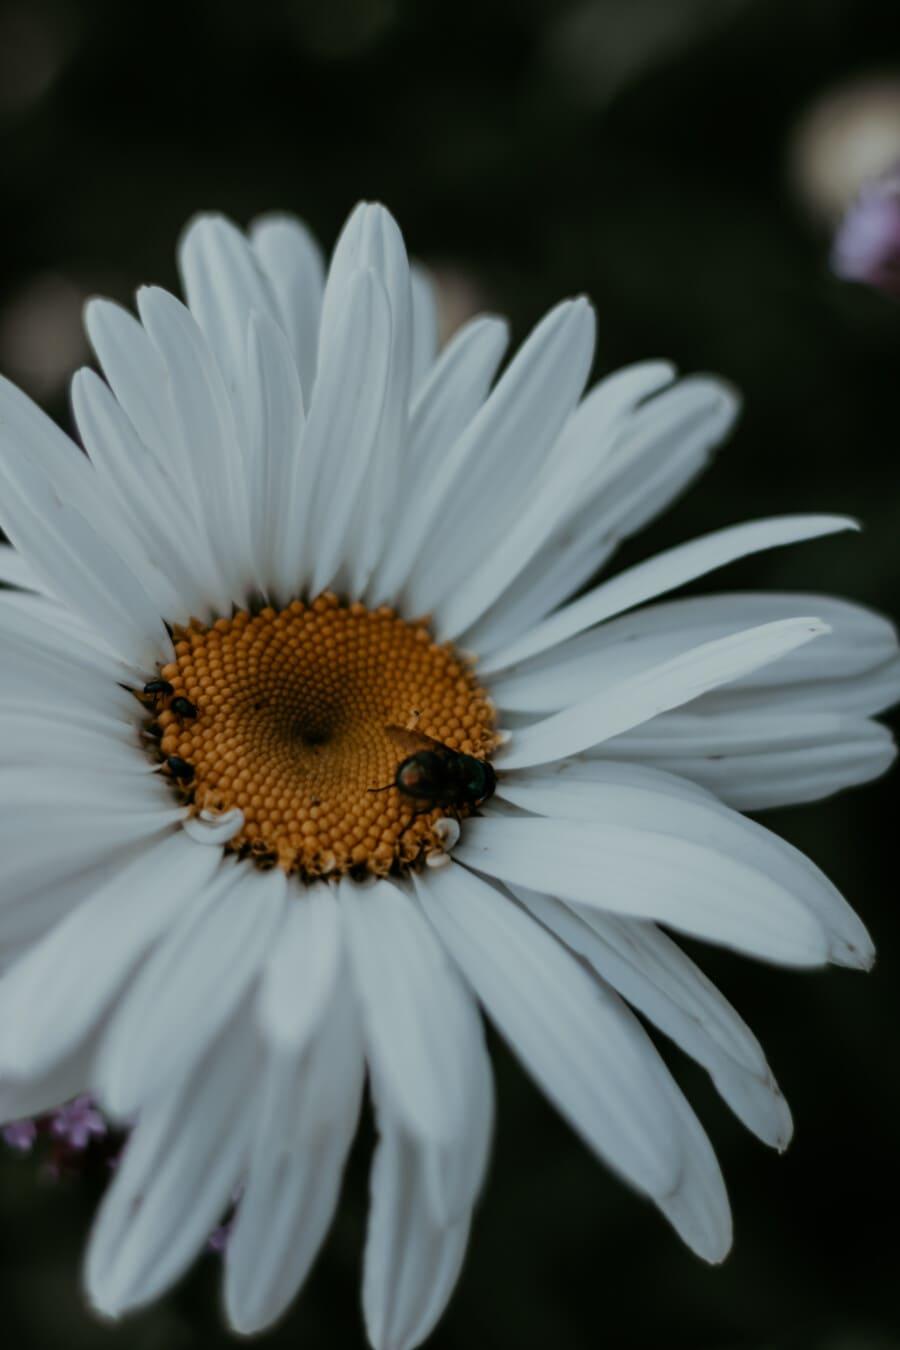 pollen, pistil, white flower, close-up, insect, flower, spring, garden, nature, plant